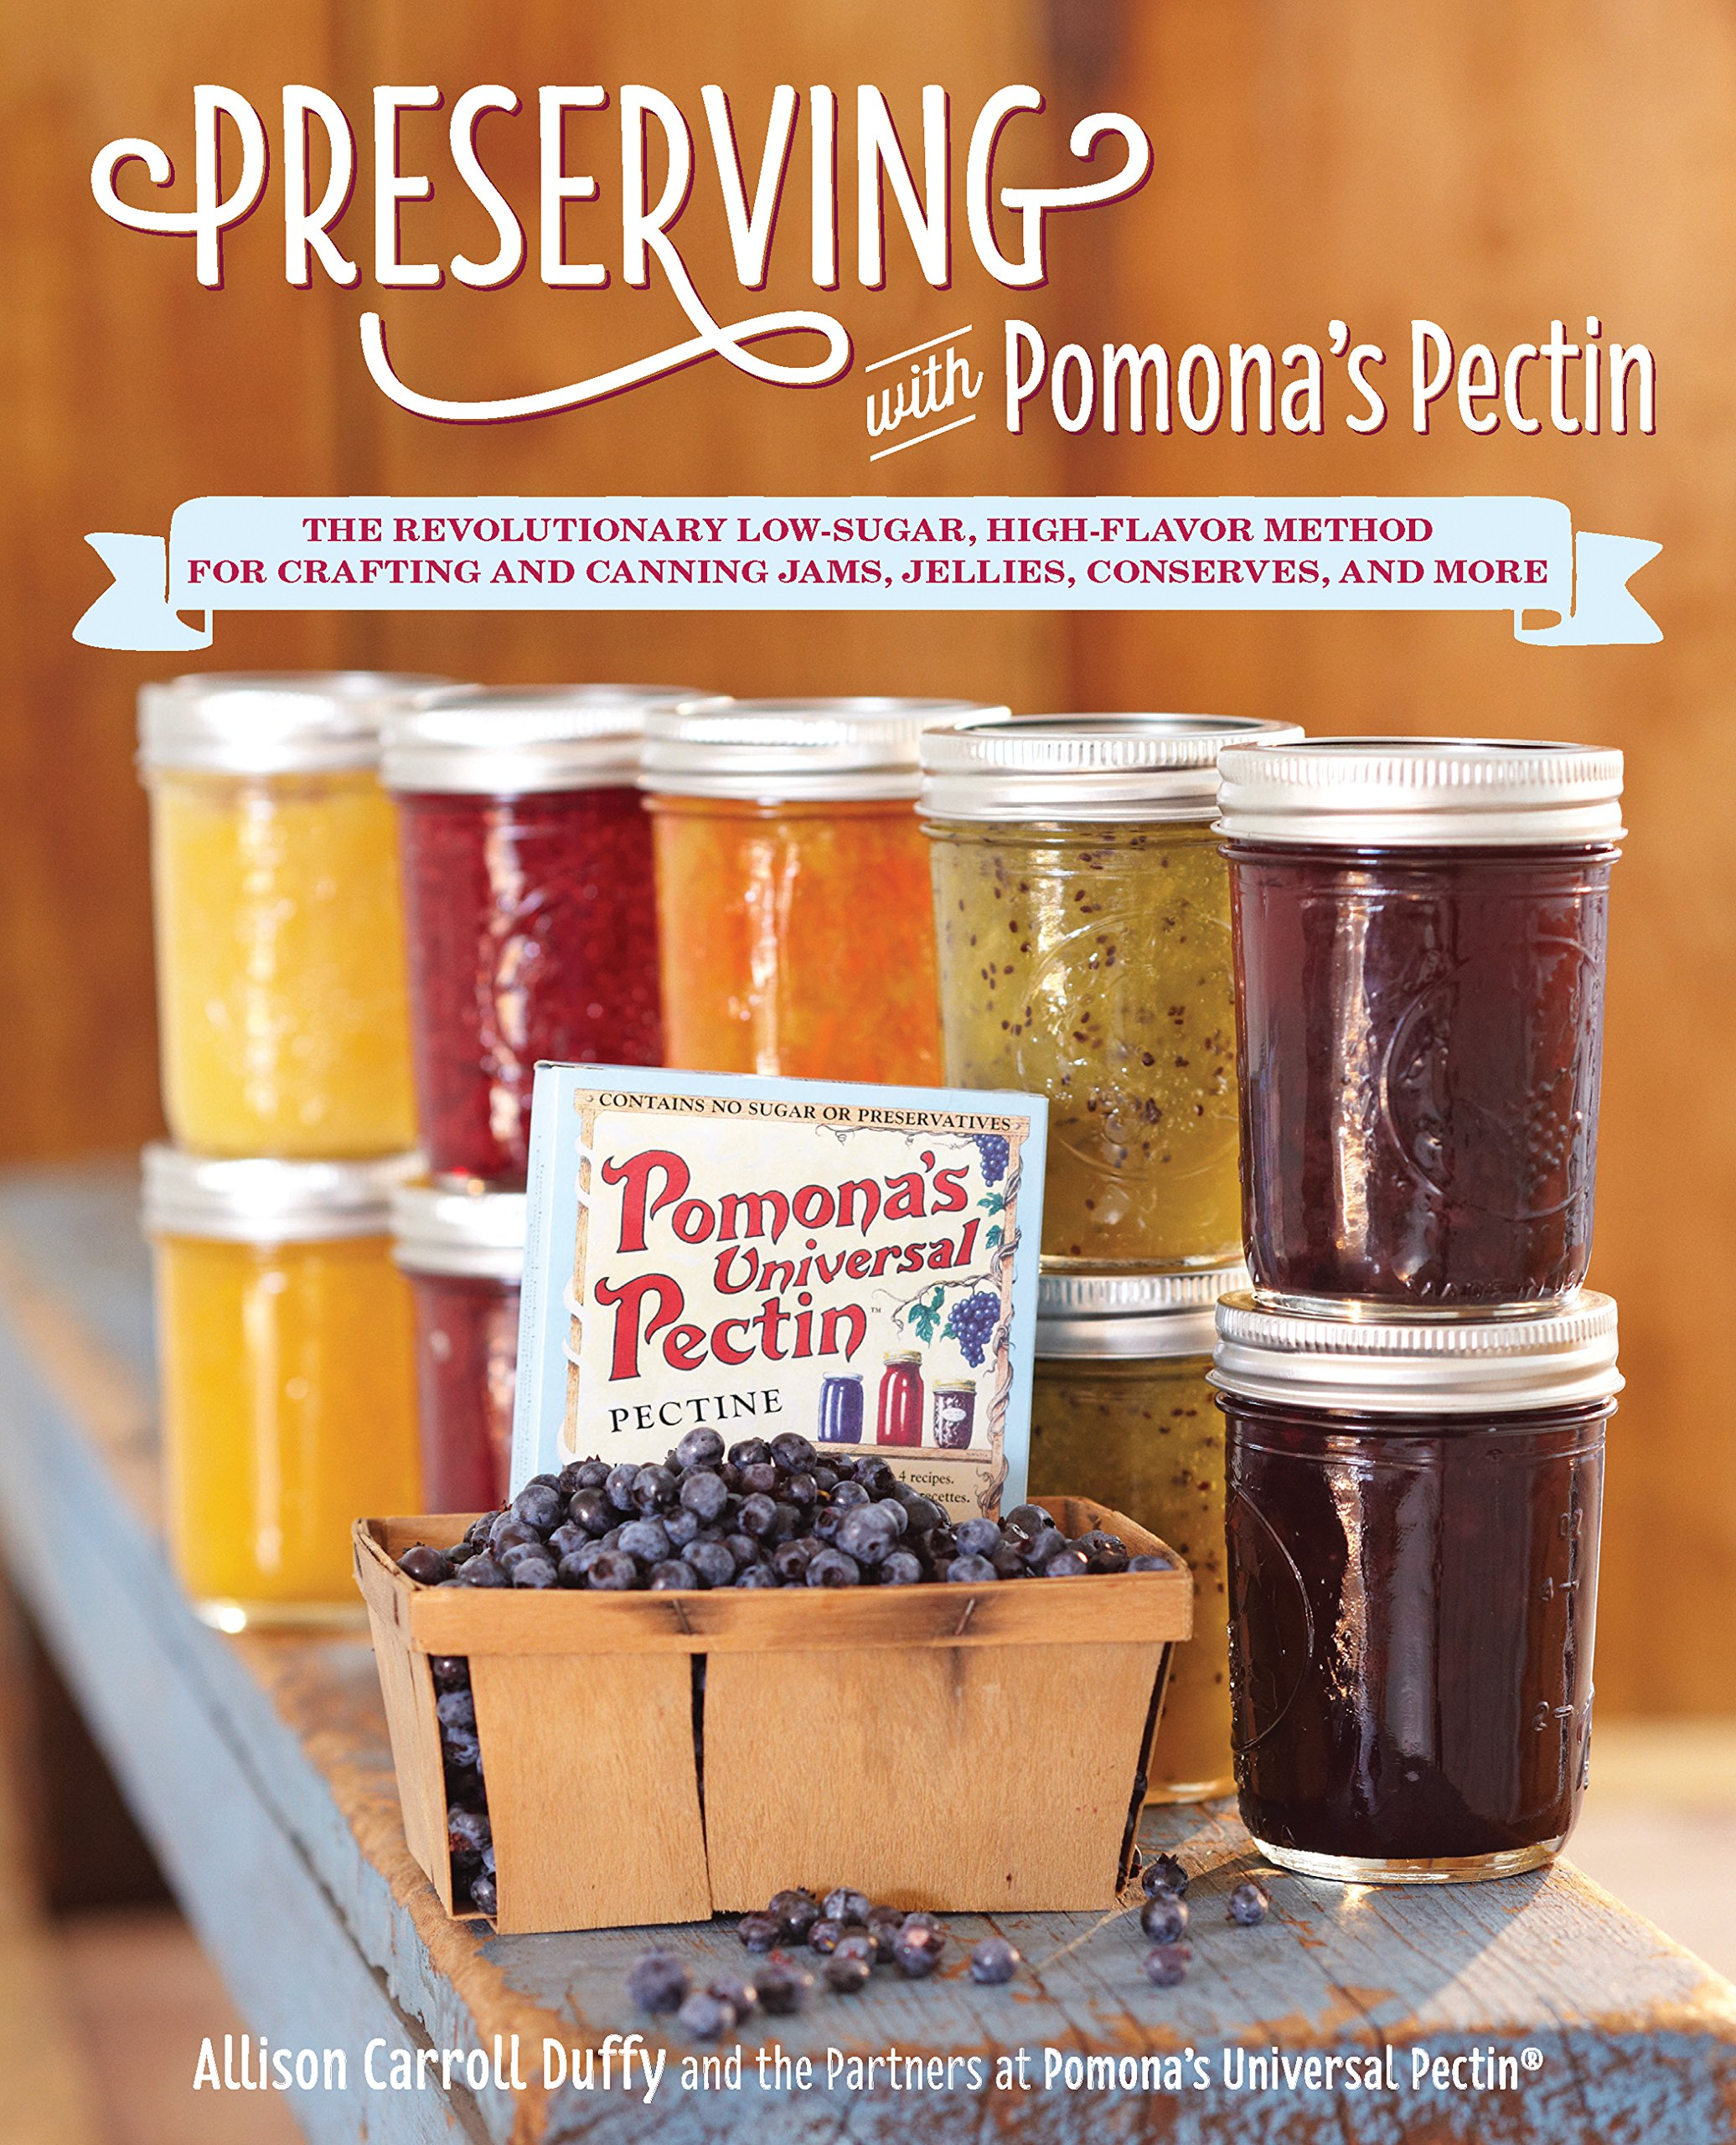 Preserving with Pomona's Pectin: The Revolutionary Low-Sugar